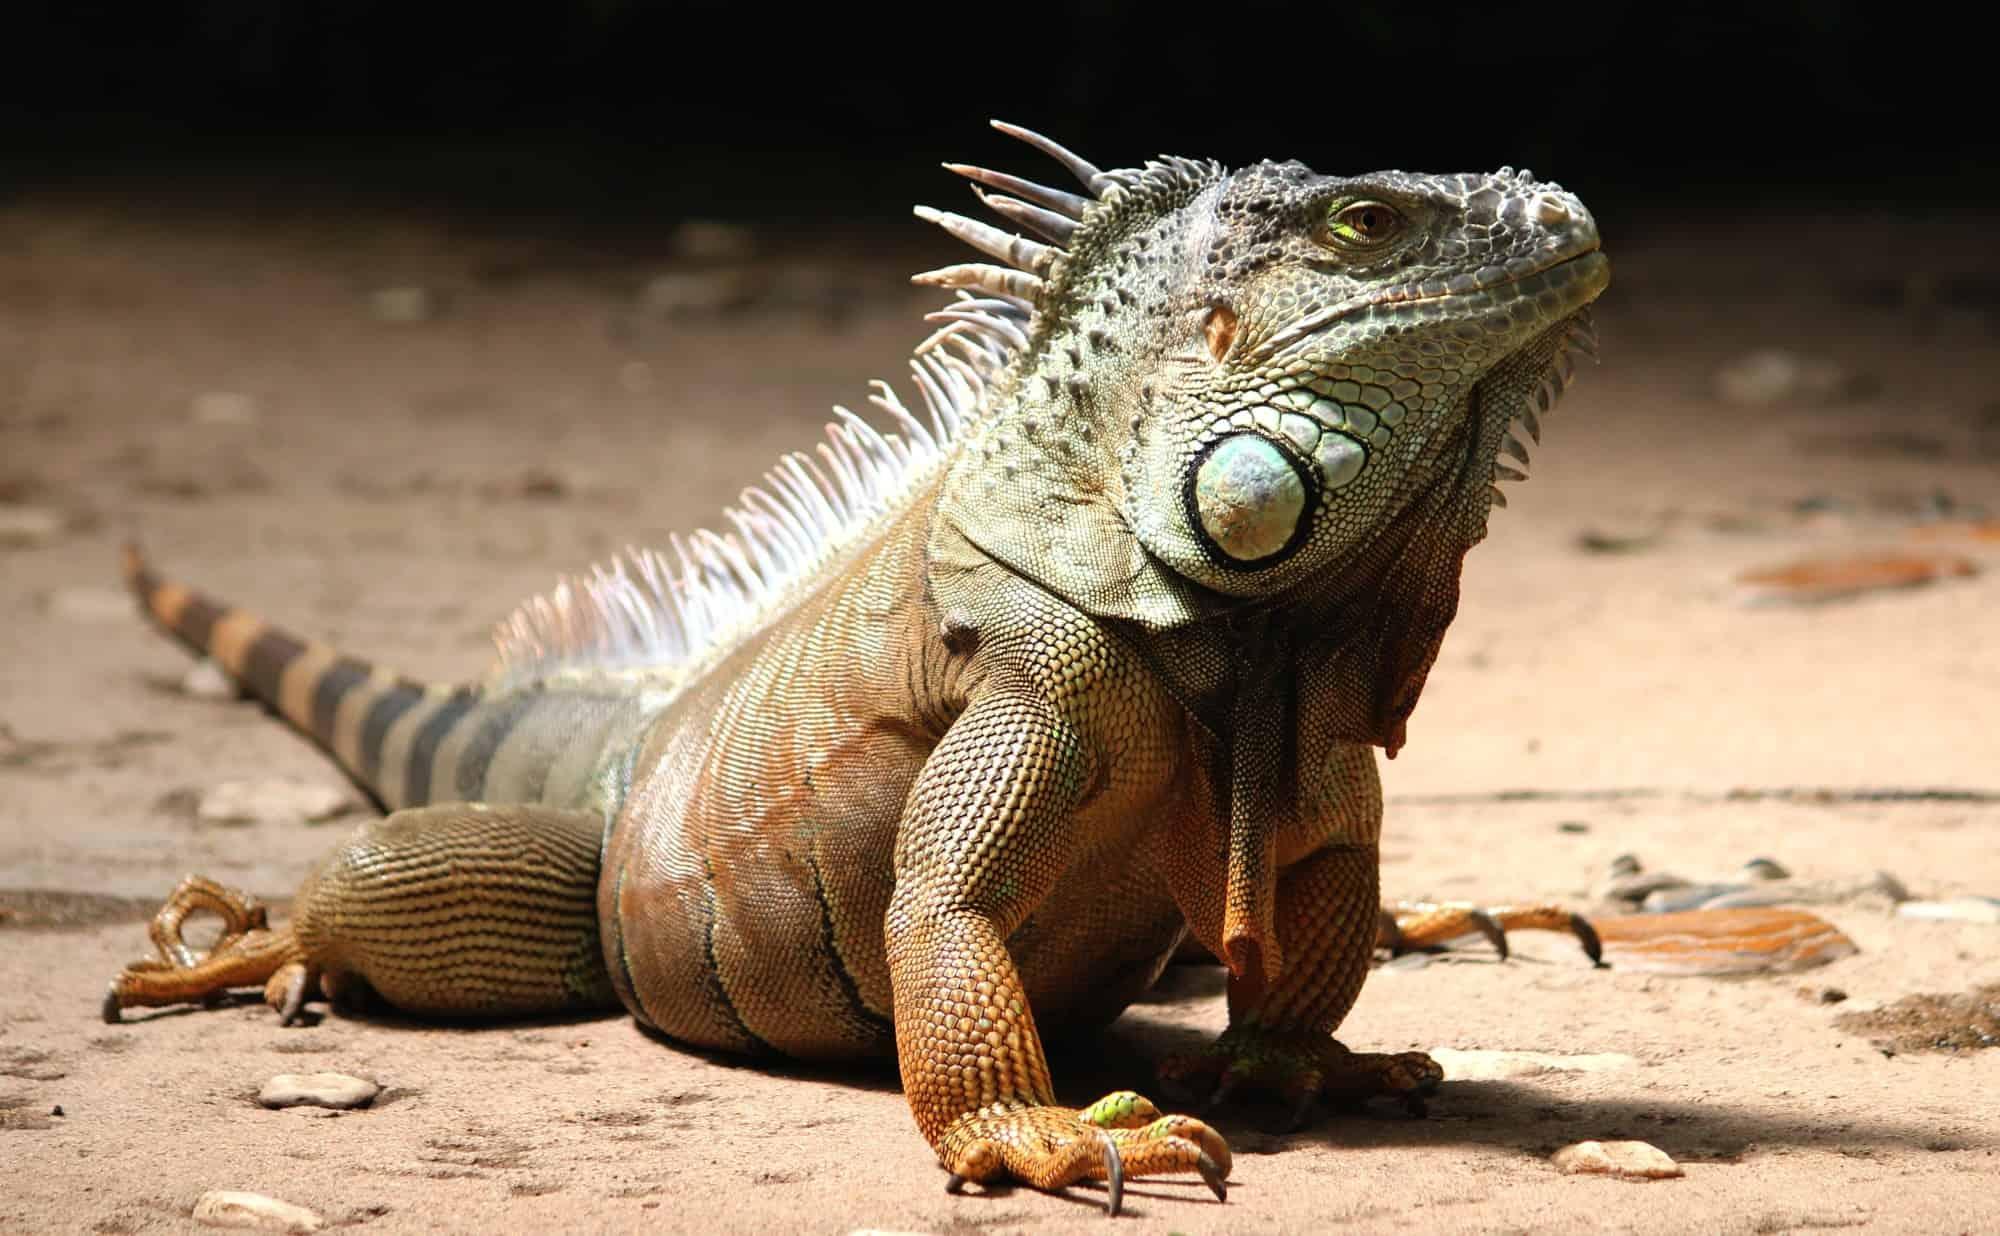 Iguana Control: What to do